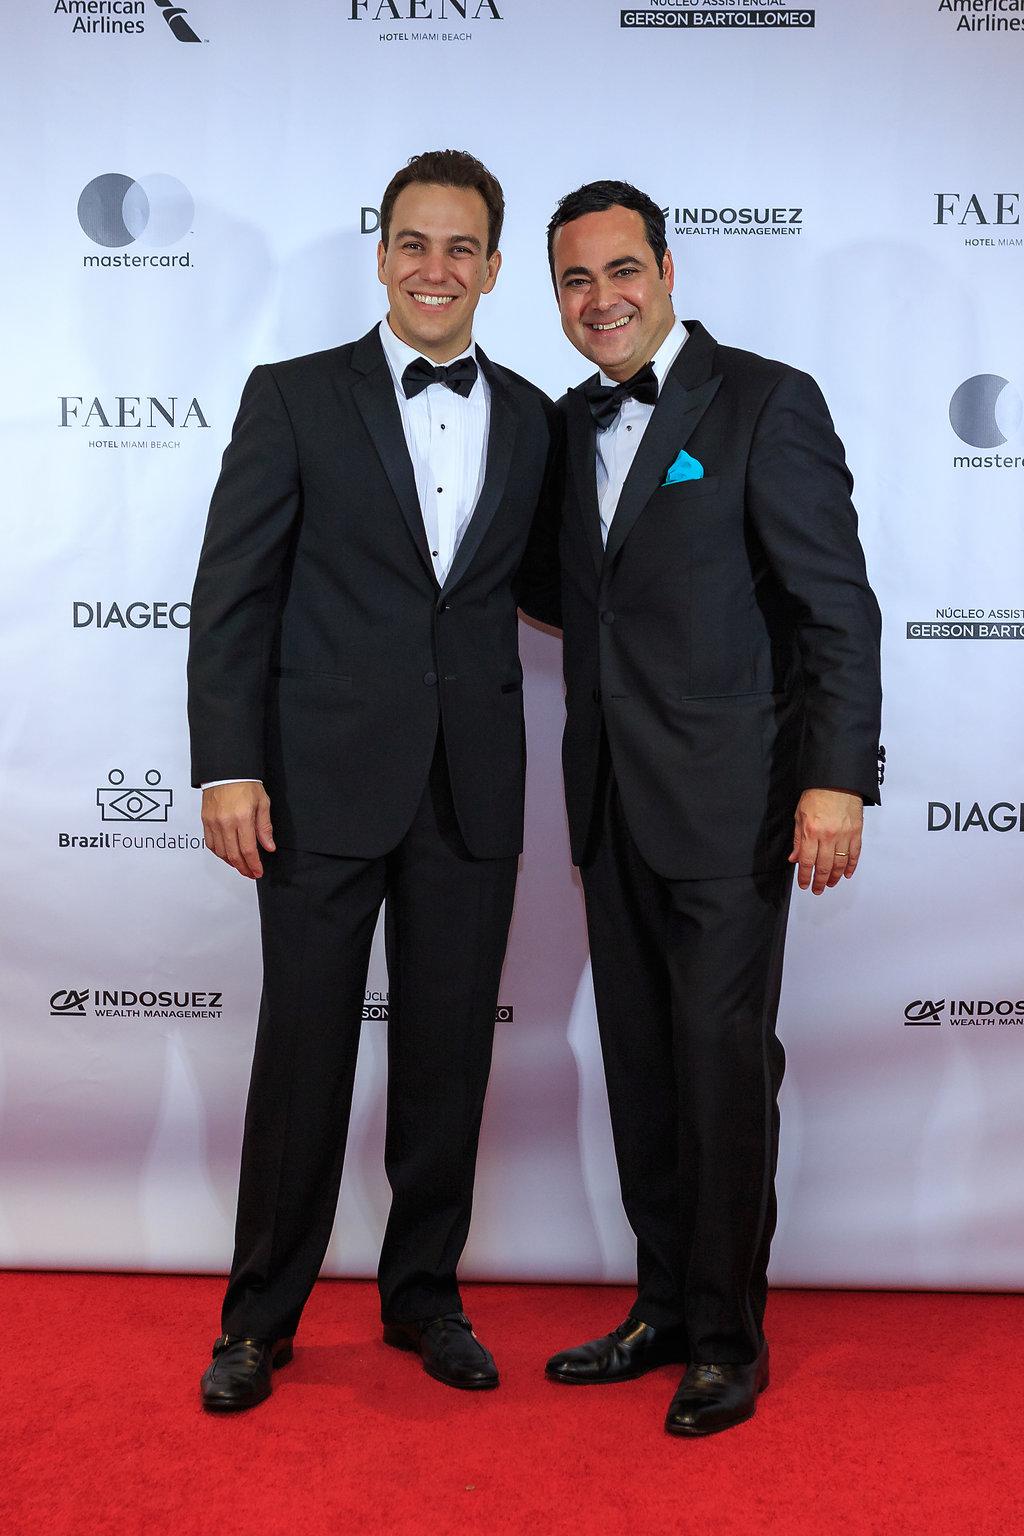 BrazilFoundation VII Gala Miami Tropical Carnival Ball Philanthropy Filantropia